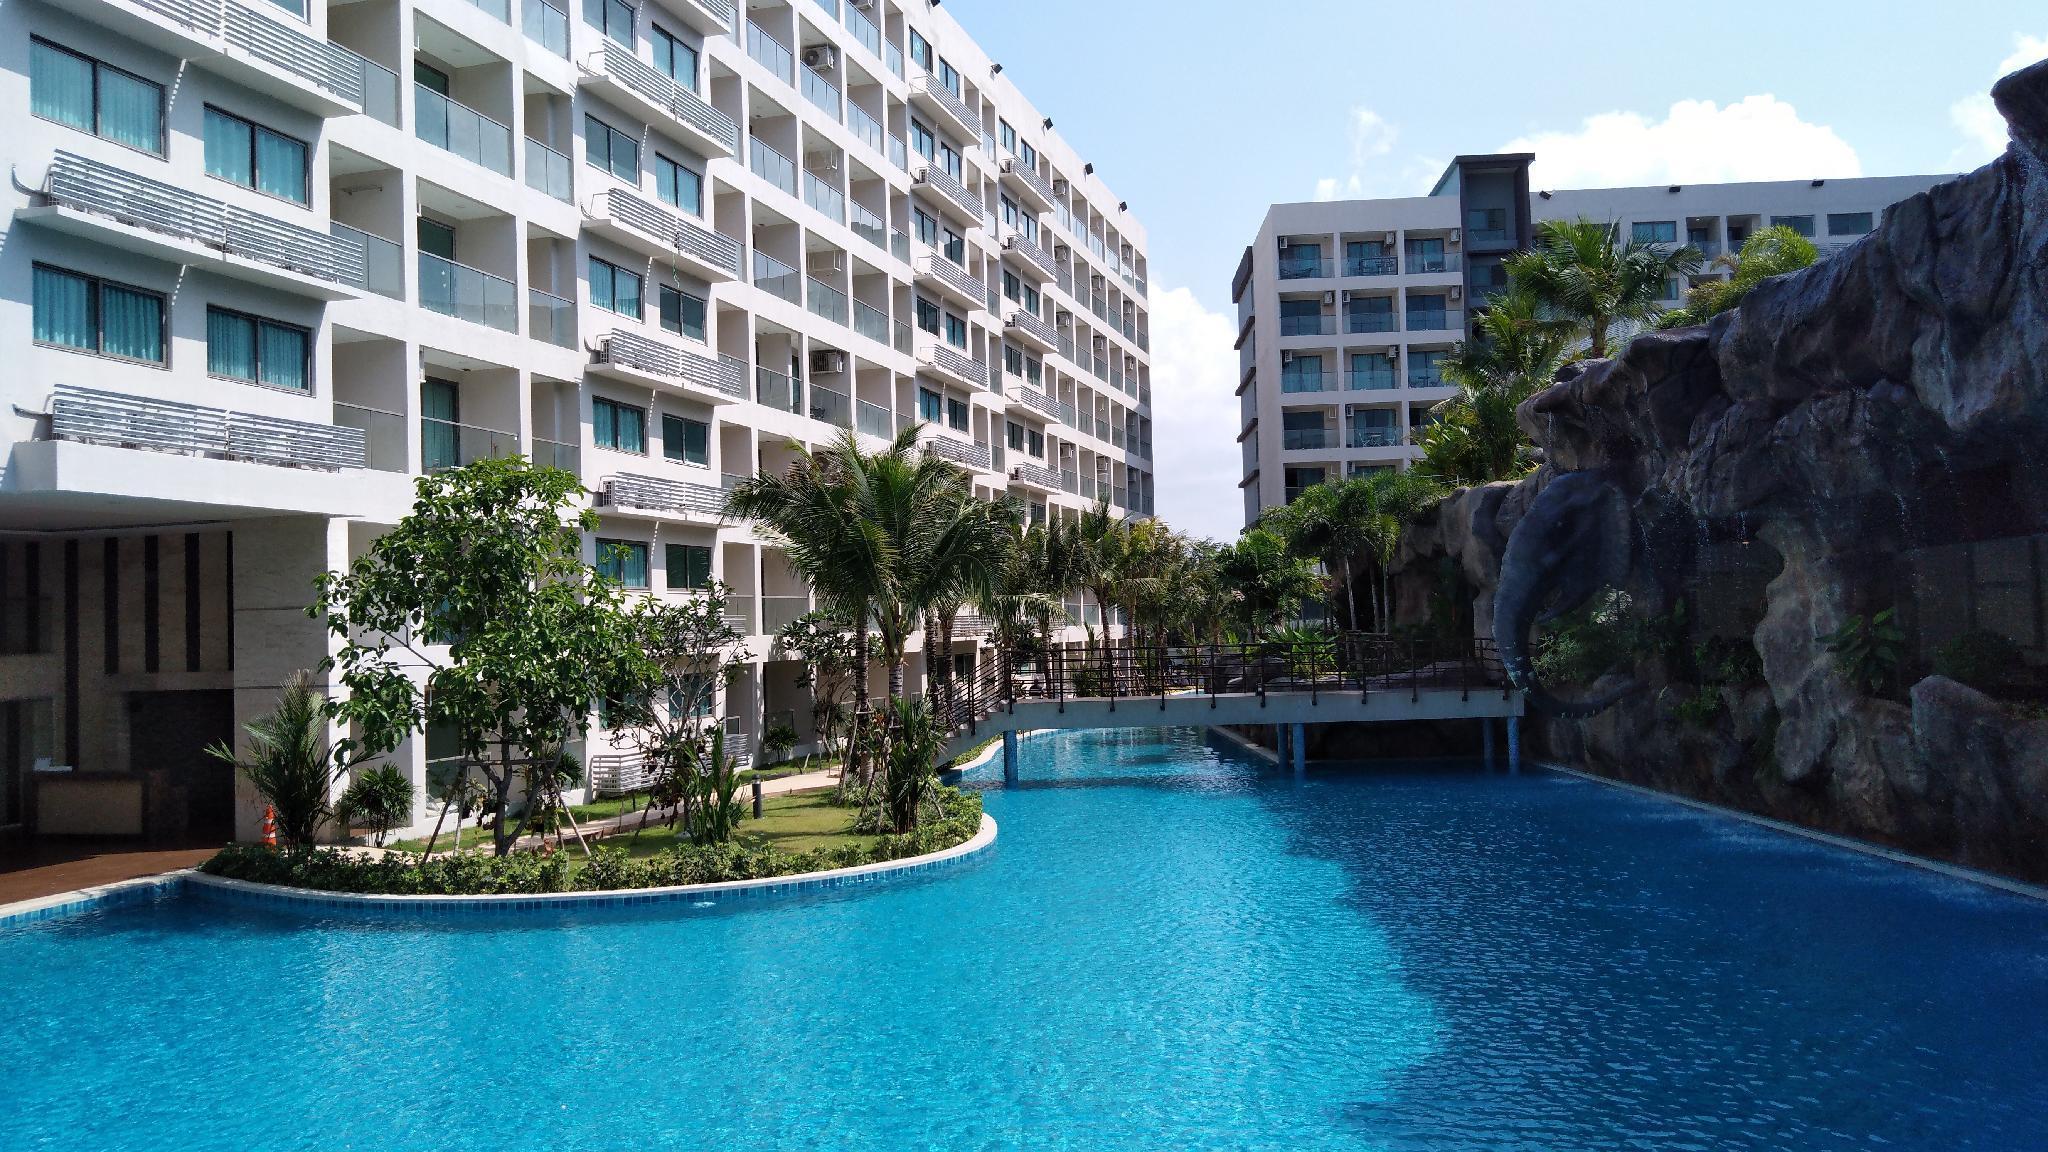 Maldives condo,Pattaya largest swim pool-pool view Maldives condo,Pattaya largest swim pool-pool view